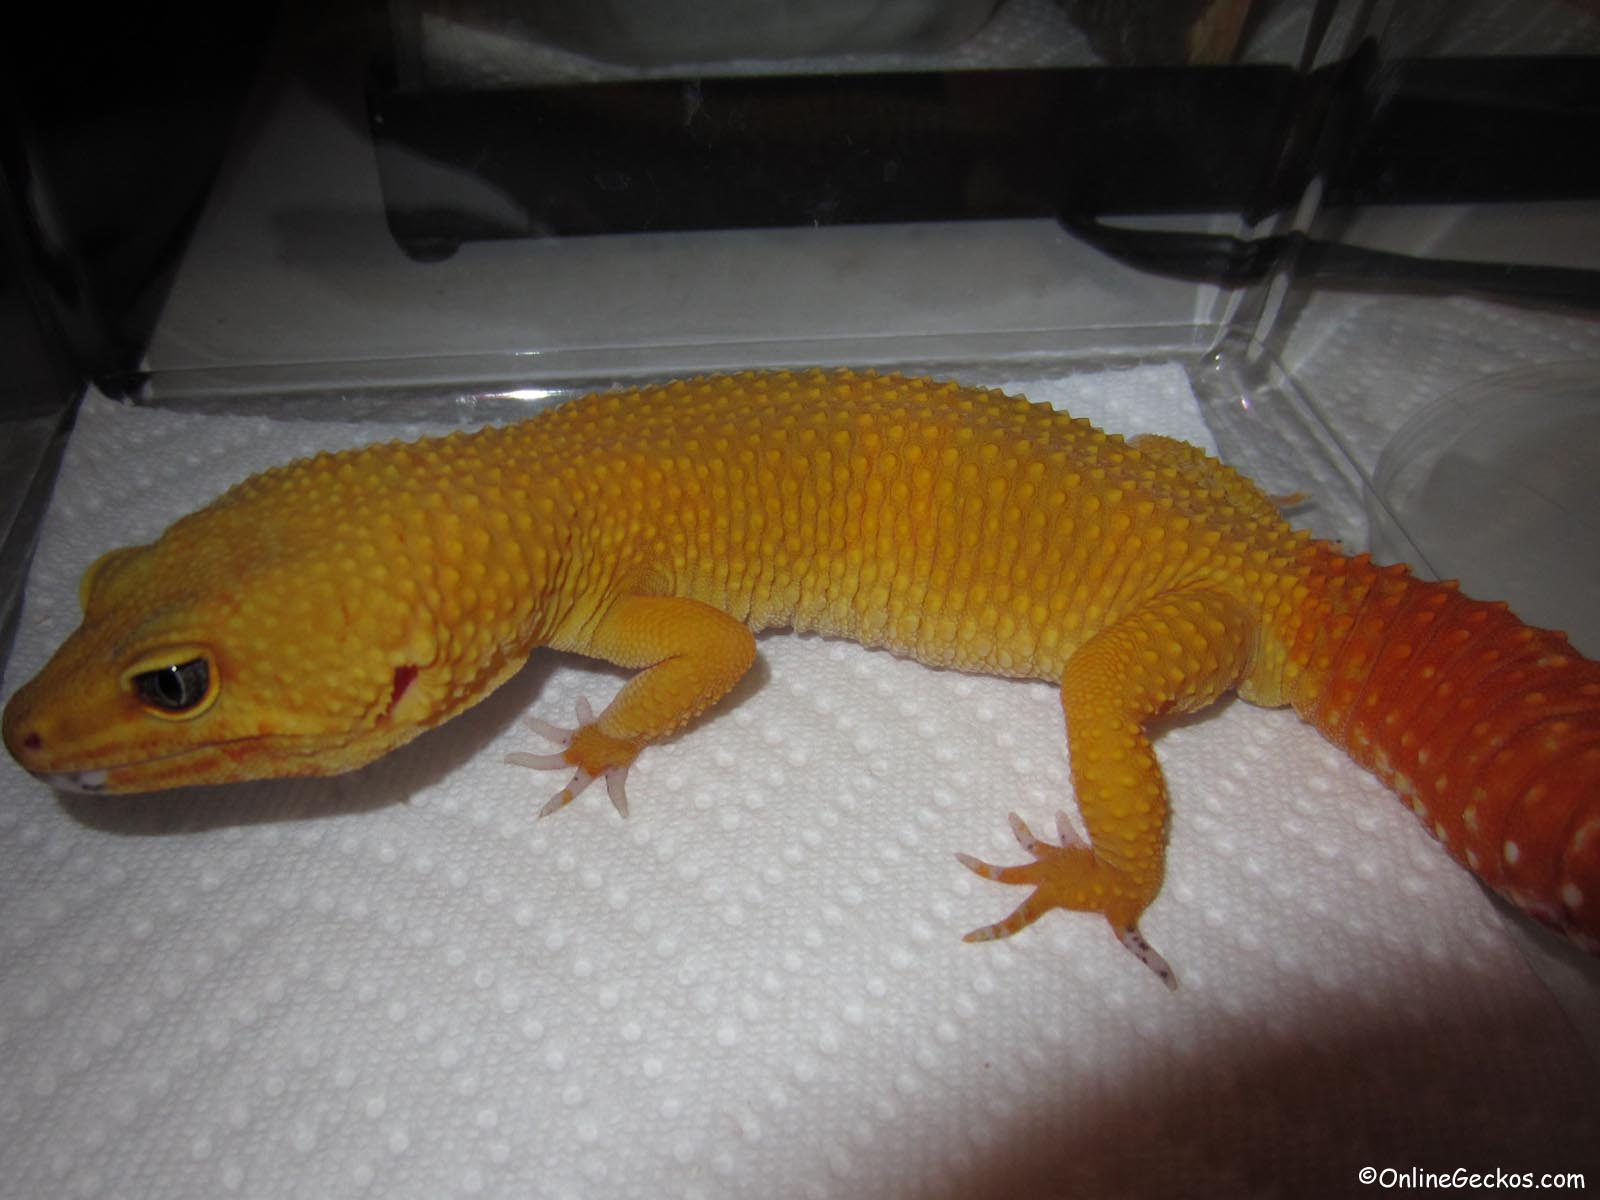 hypo tangerine baldy x normal